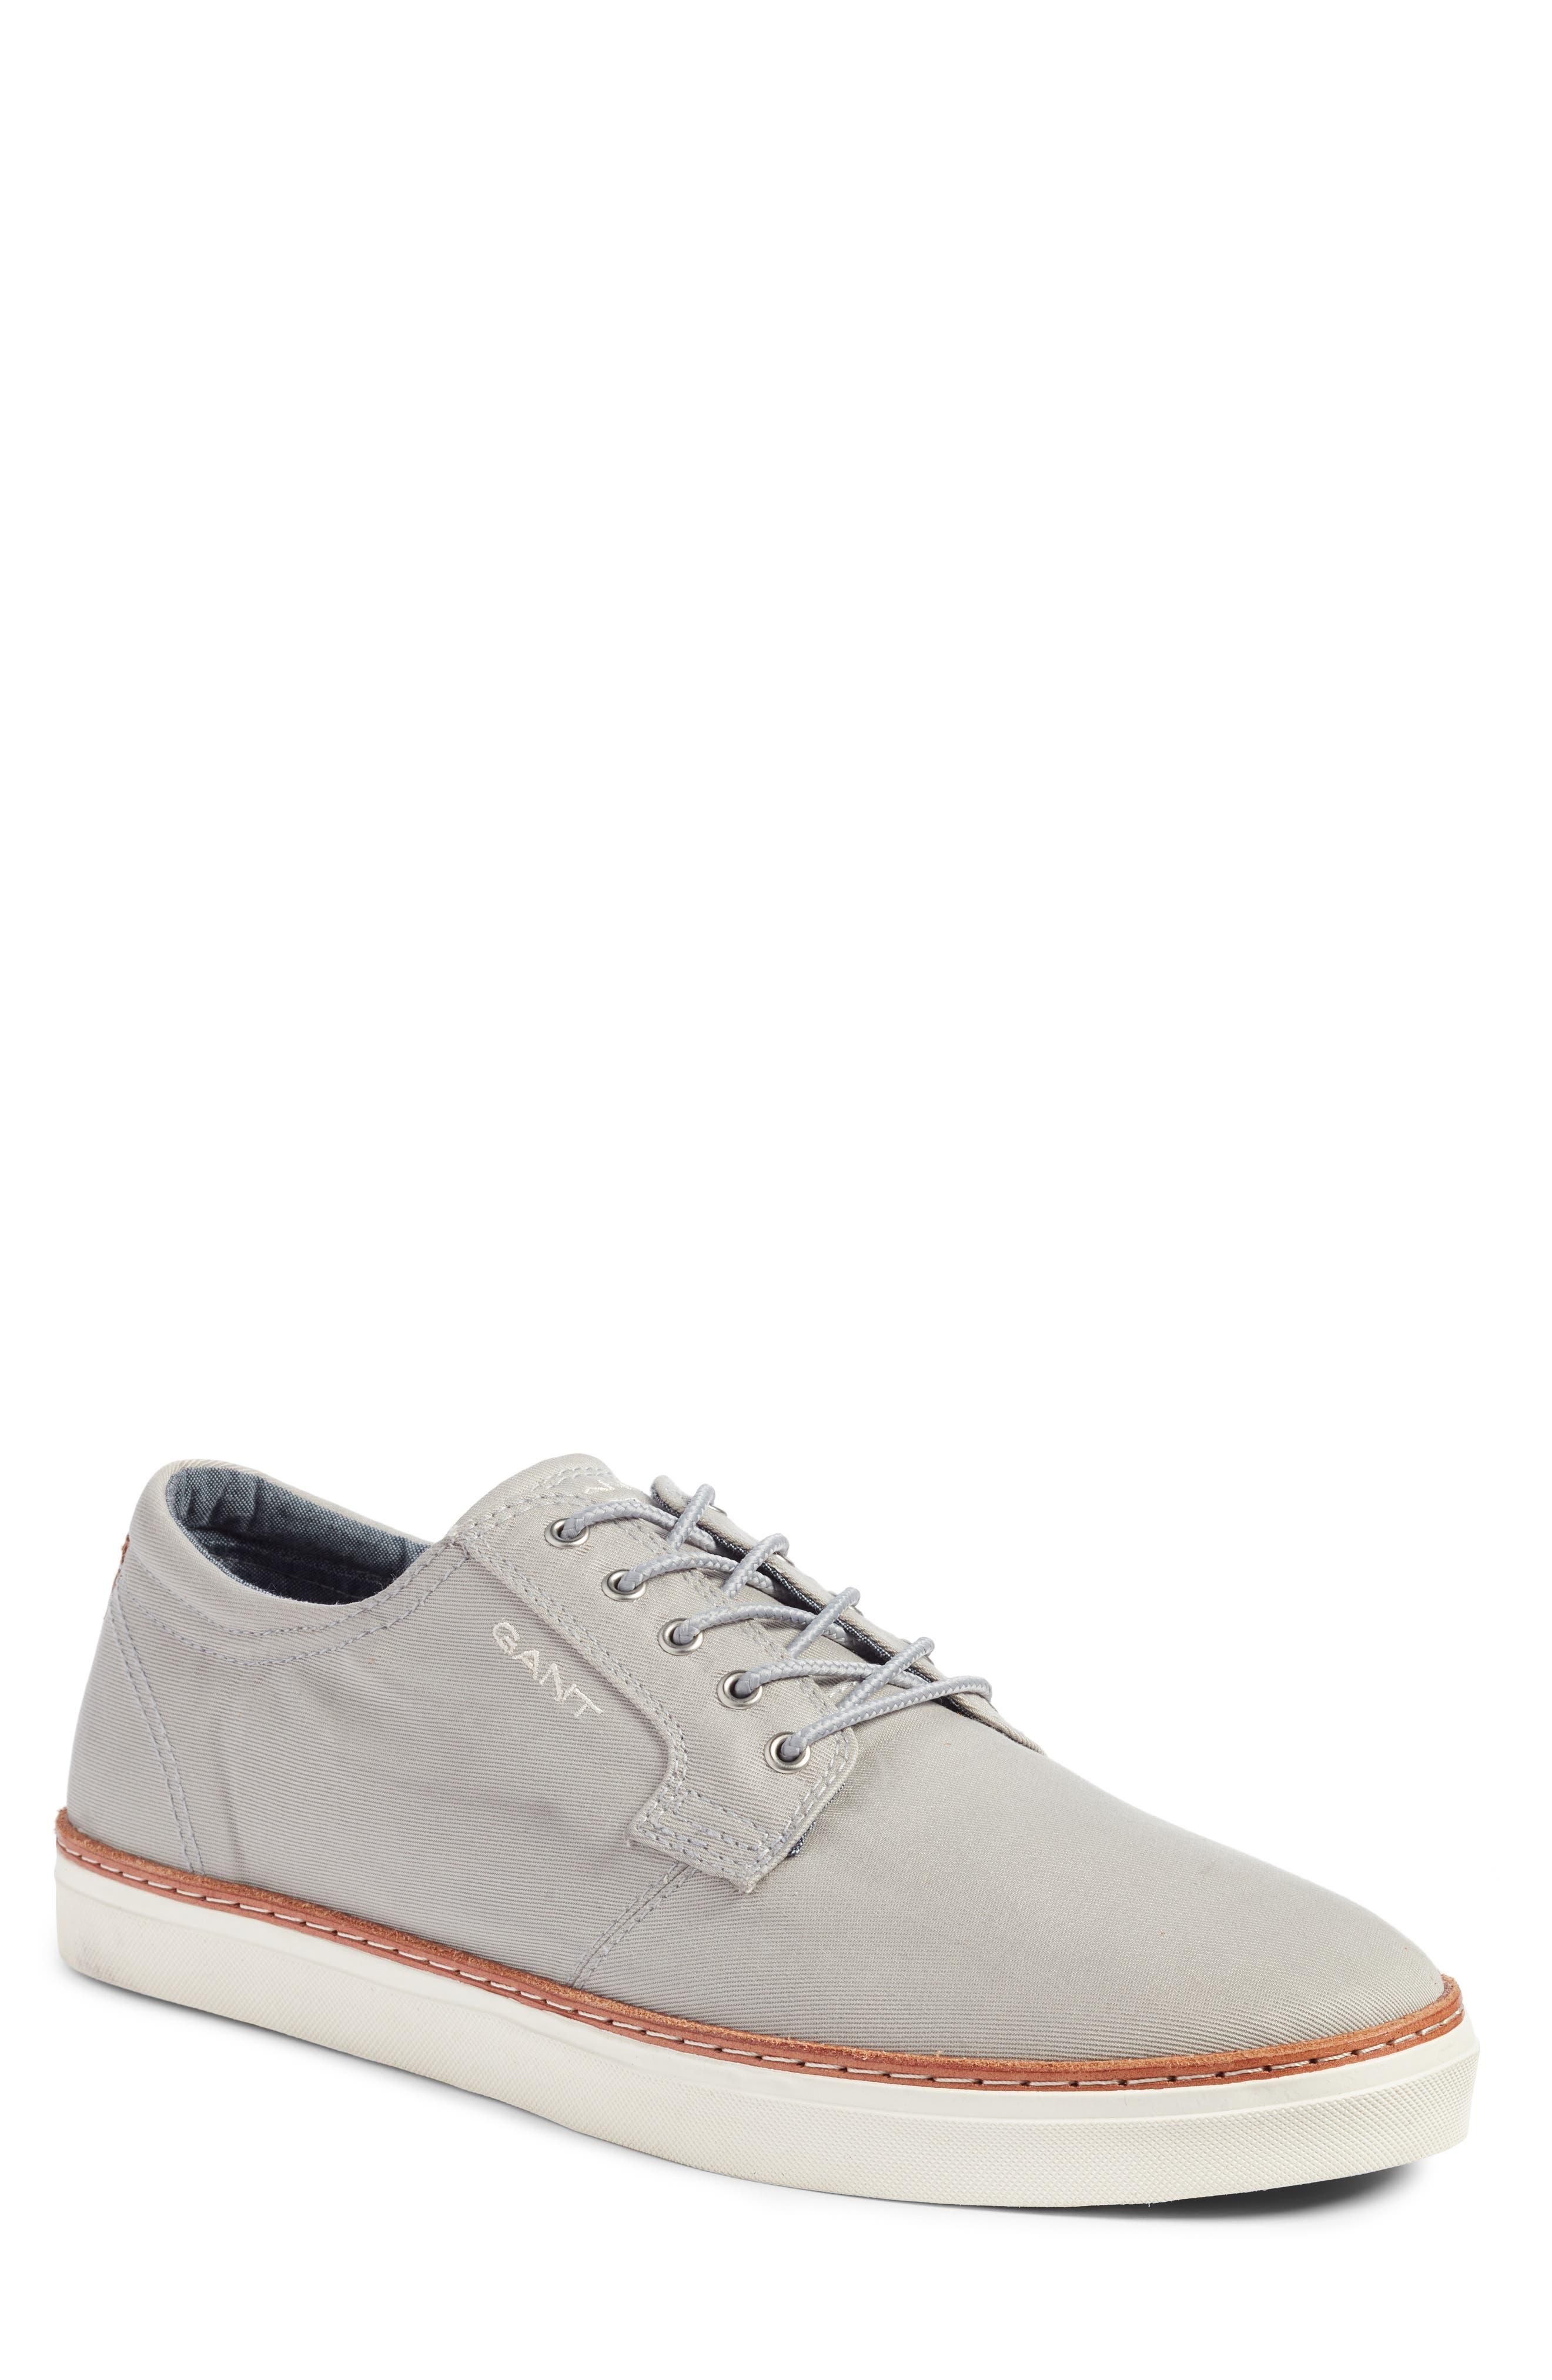 Bari Sneaker,                         Main,                         color, SLEET GRAY